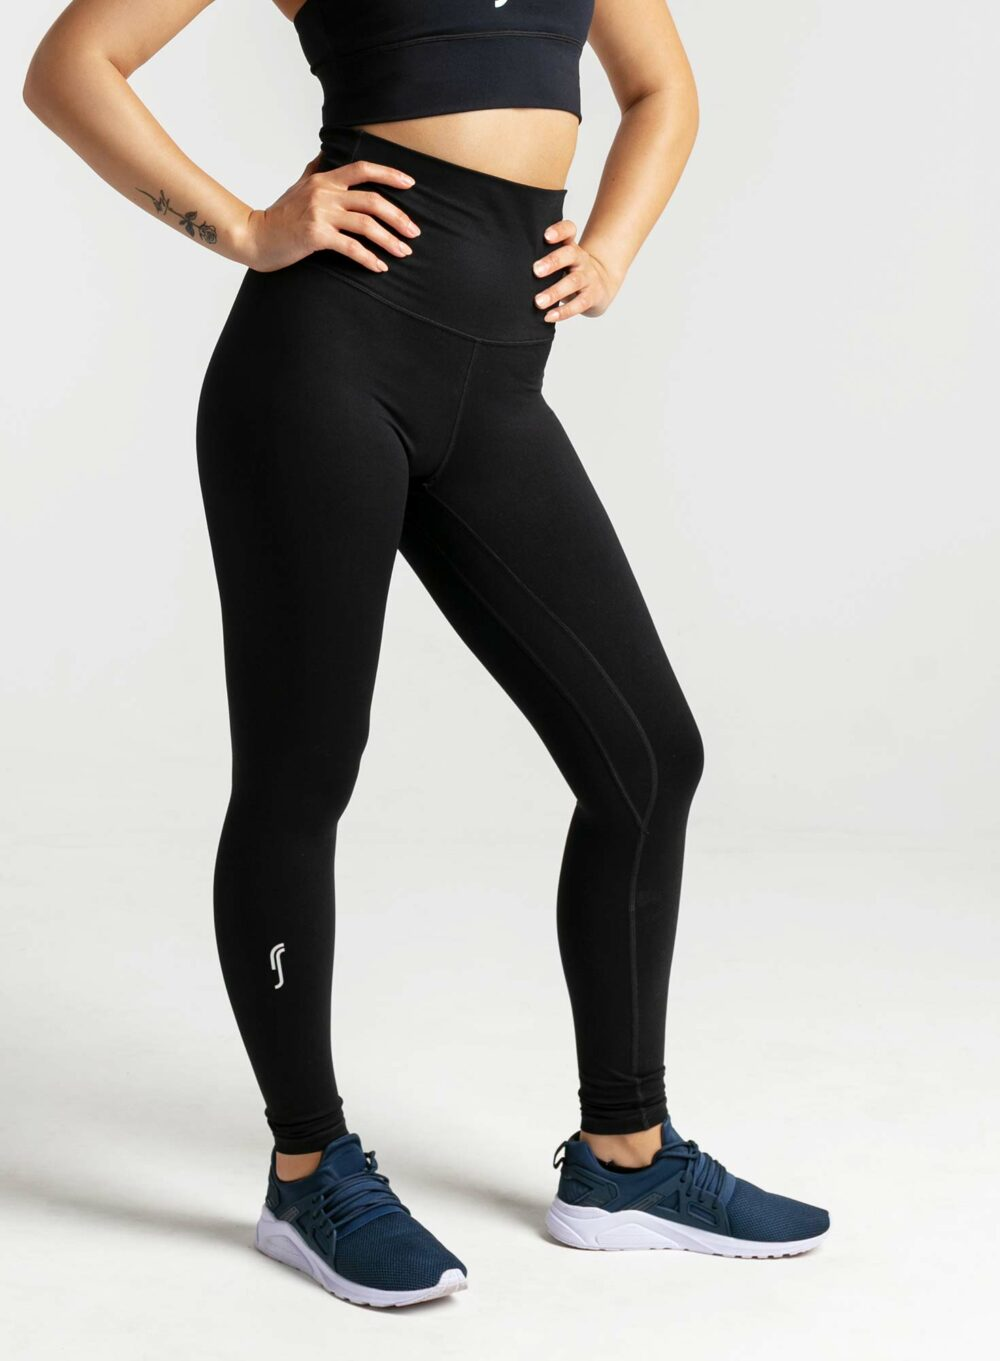 rs_sports_leggings_black_1